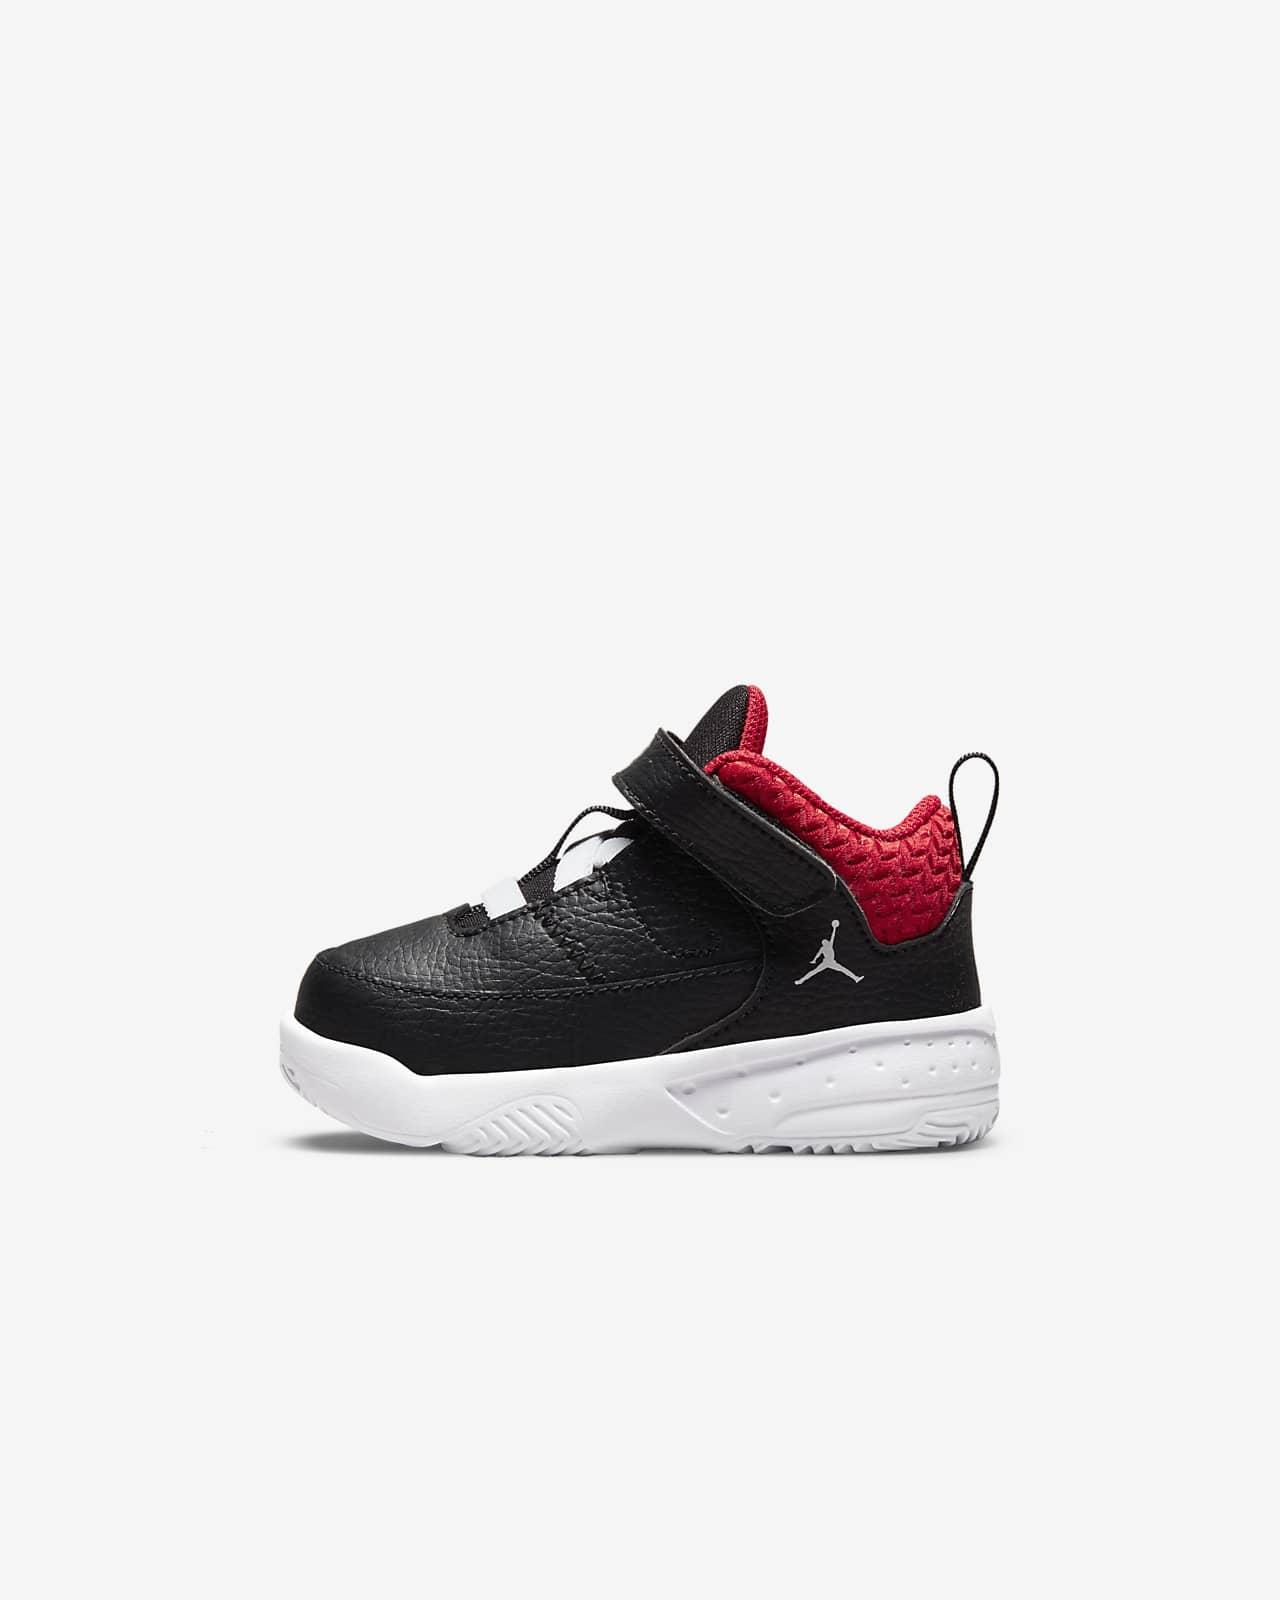 Jordan Max Aura 3 Baby & Toddler Shoe